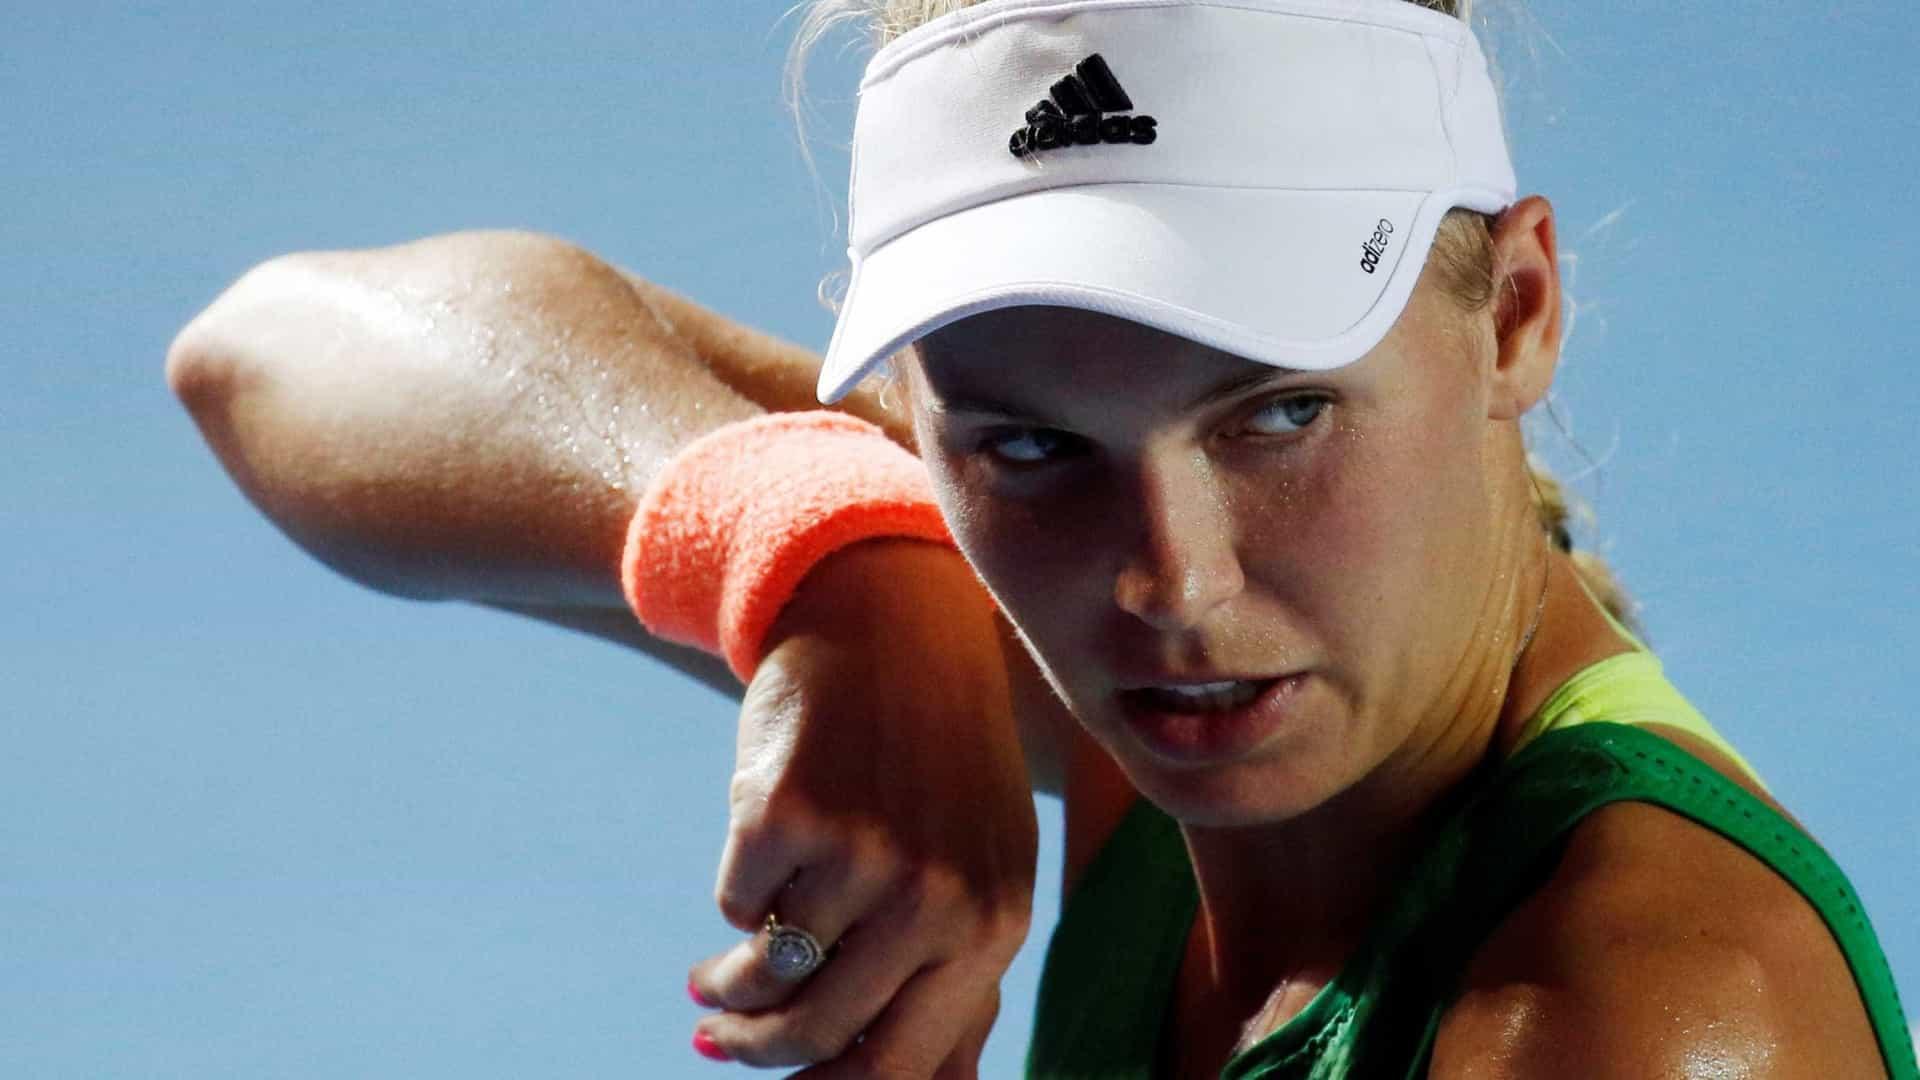 naom 580270606b76a - TÊNIS: Serena é eliminada no Aberto da Austrália e Wozniacki se aposenta